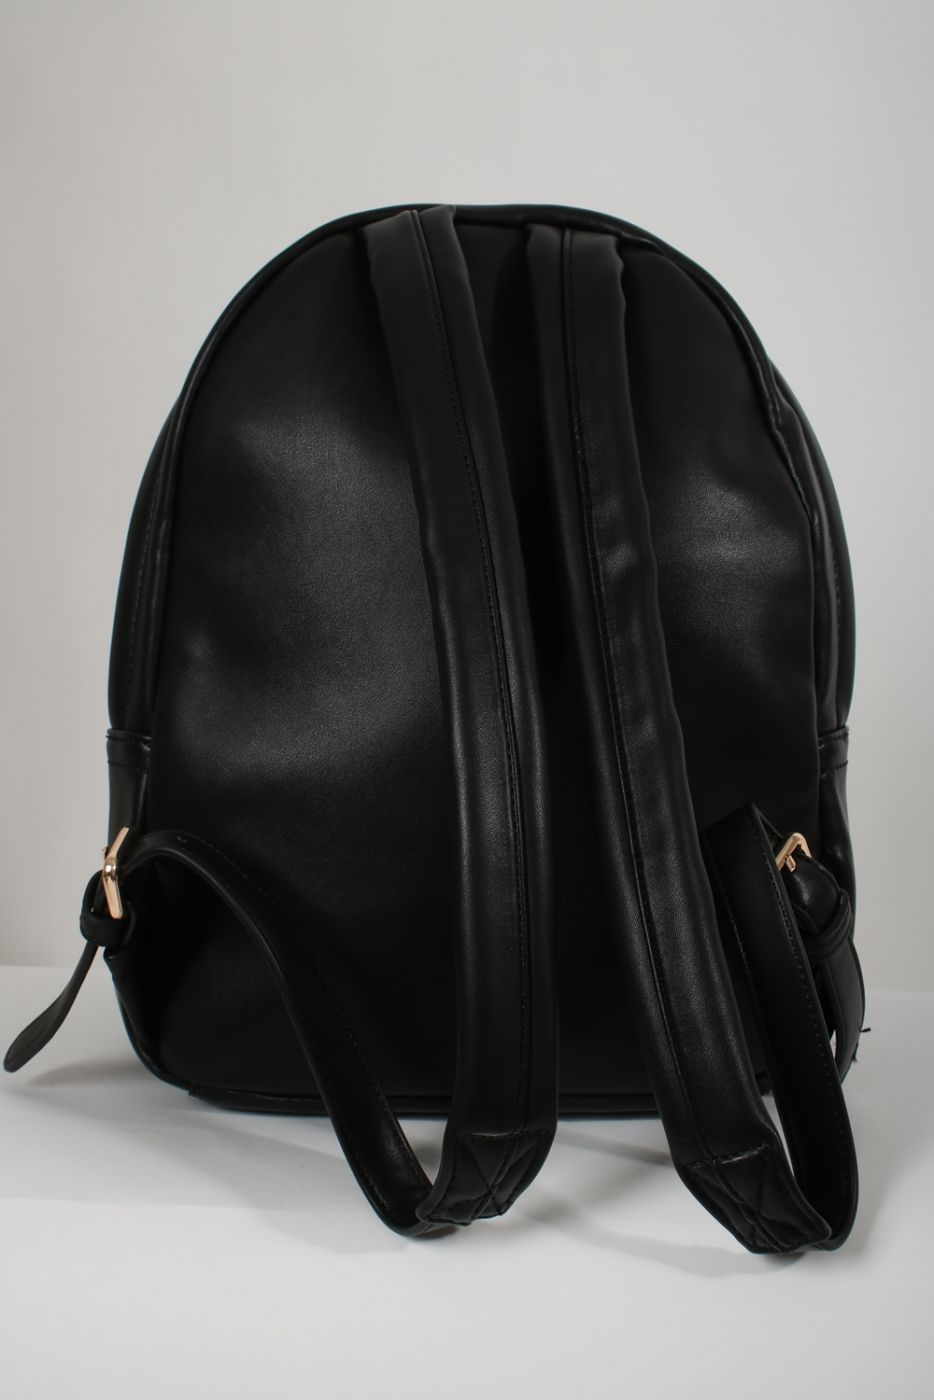 0d20ce729a891 Modny czarny plecak marki ice z ekologicznej skóry | sklep ...